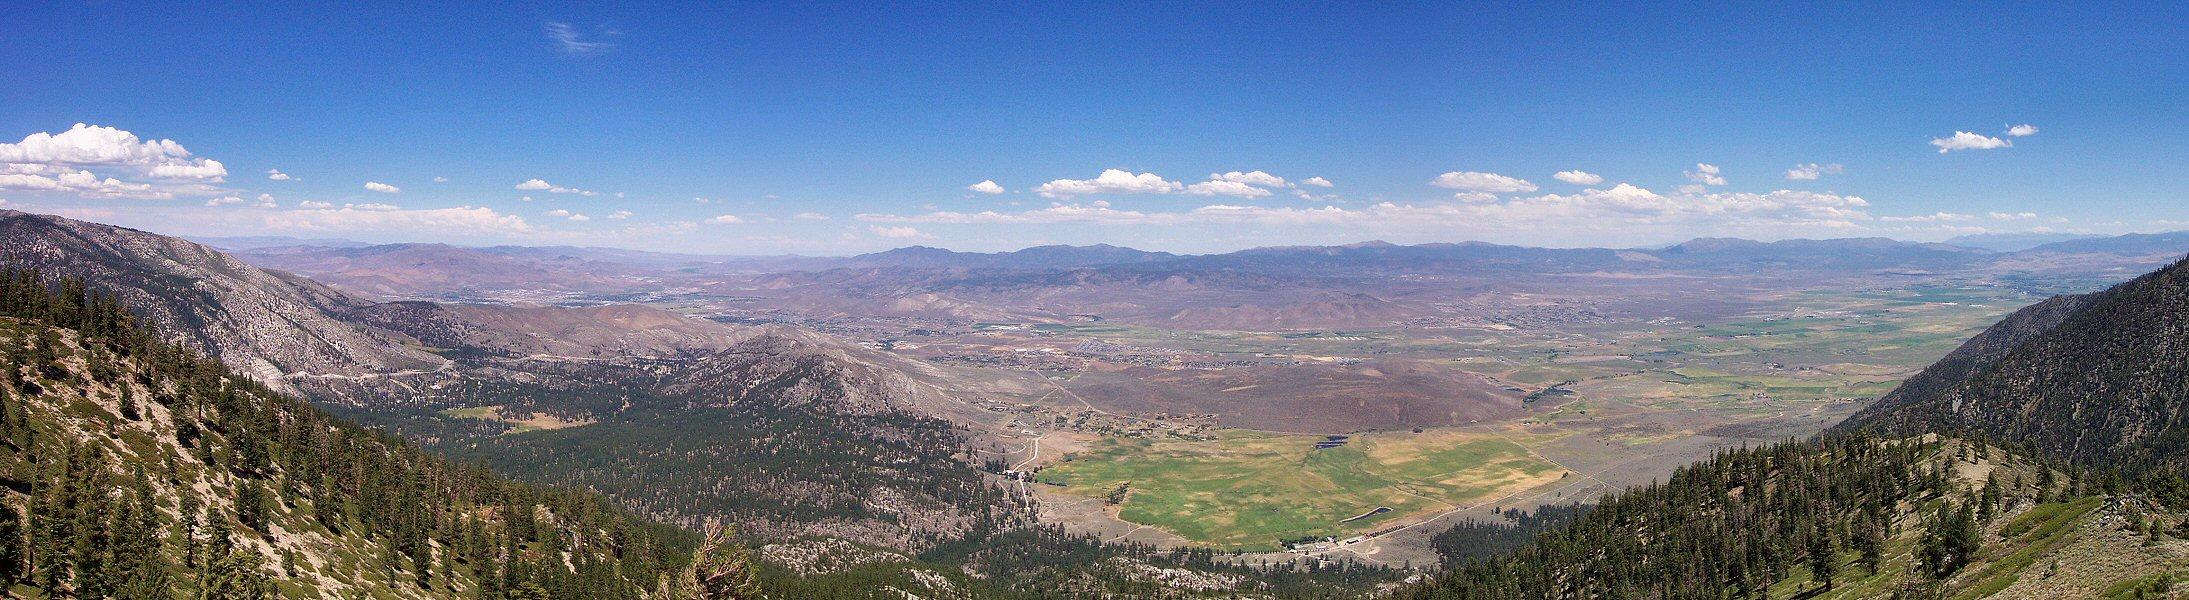 Duane Bliss Peak